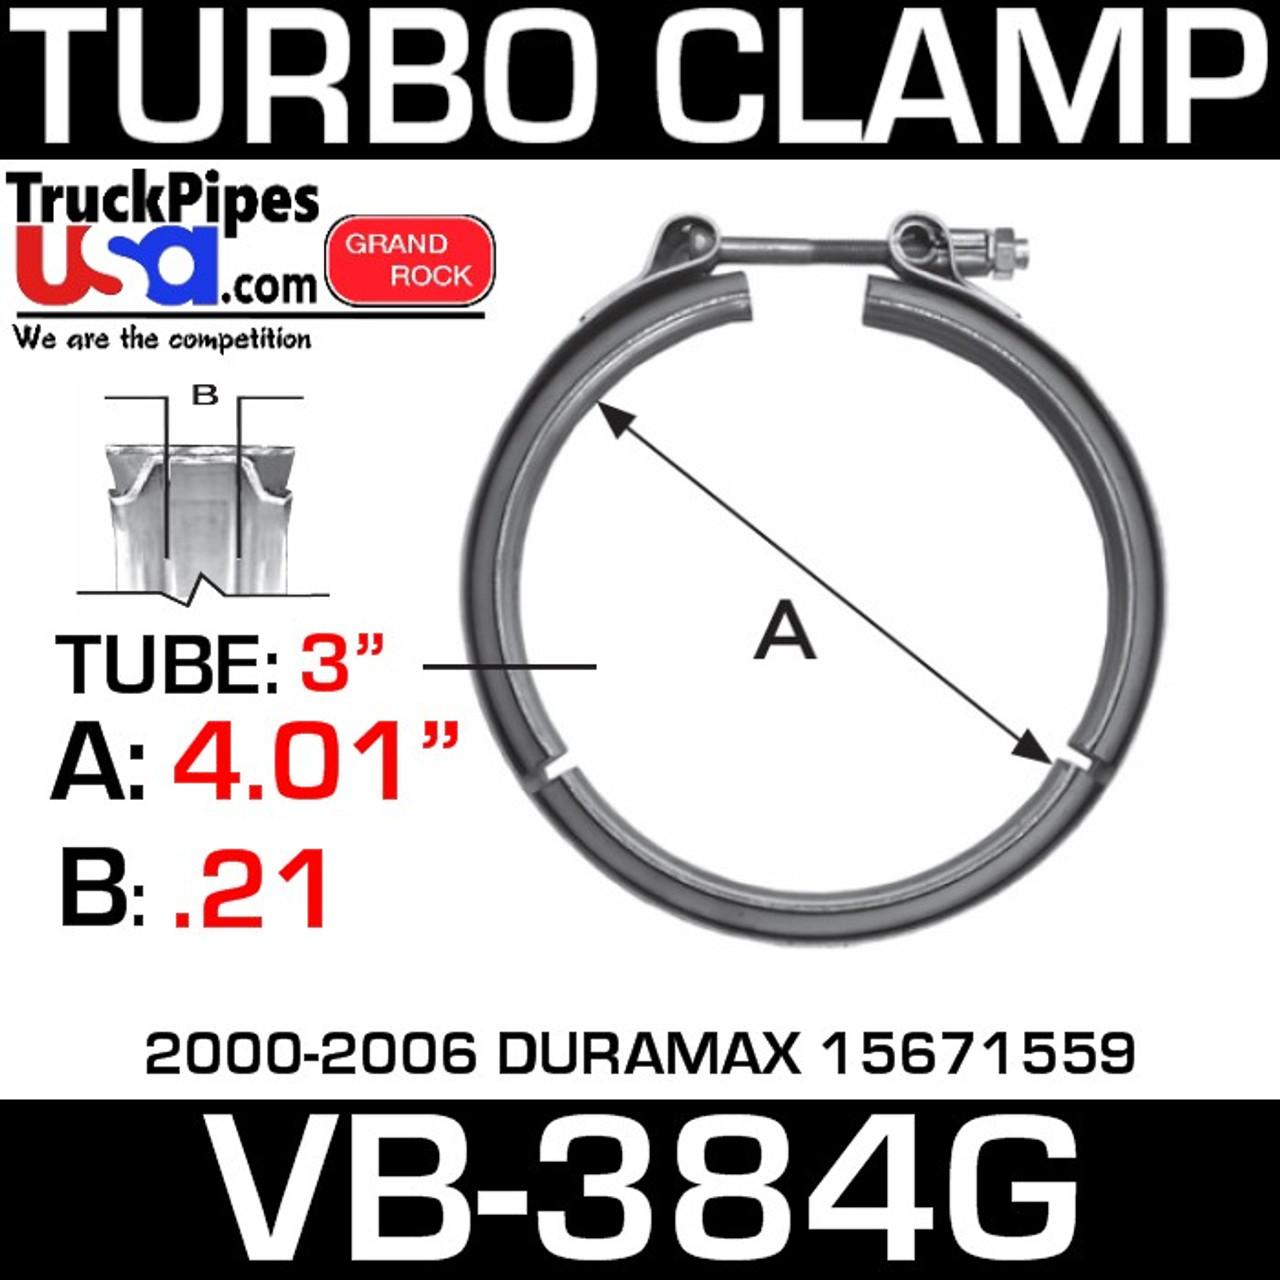 15671559 Turbo V-Clamp 2000-2006 DURAMAX VB-384G